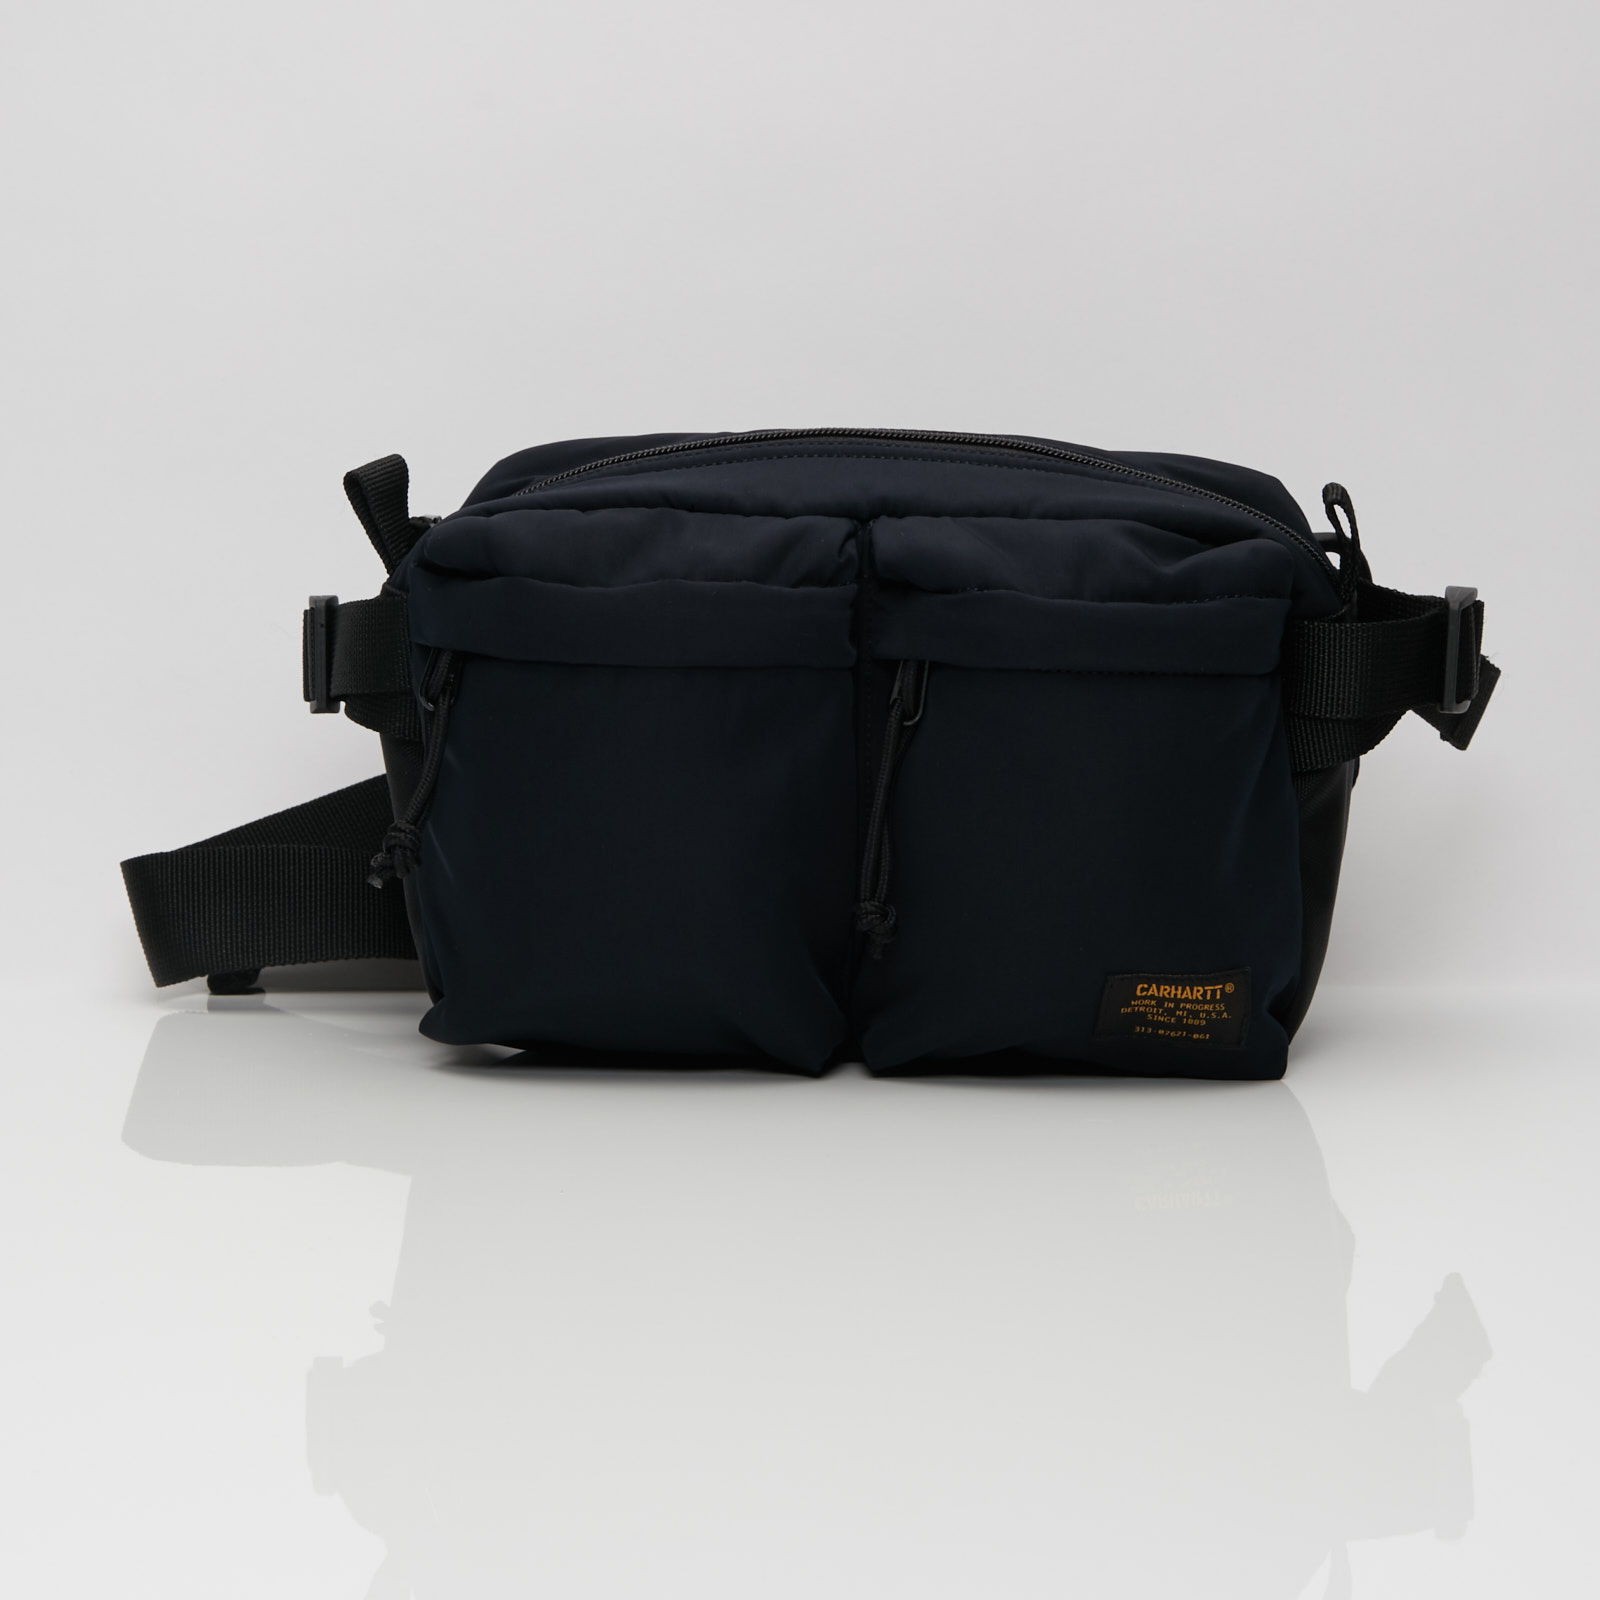 41ac3c619a Carhartt WIP Military Hip Bag - I024252.1c.90.06 - Sneakersnstuff ...